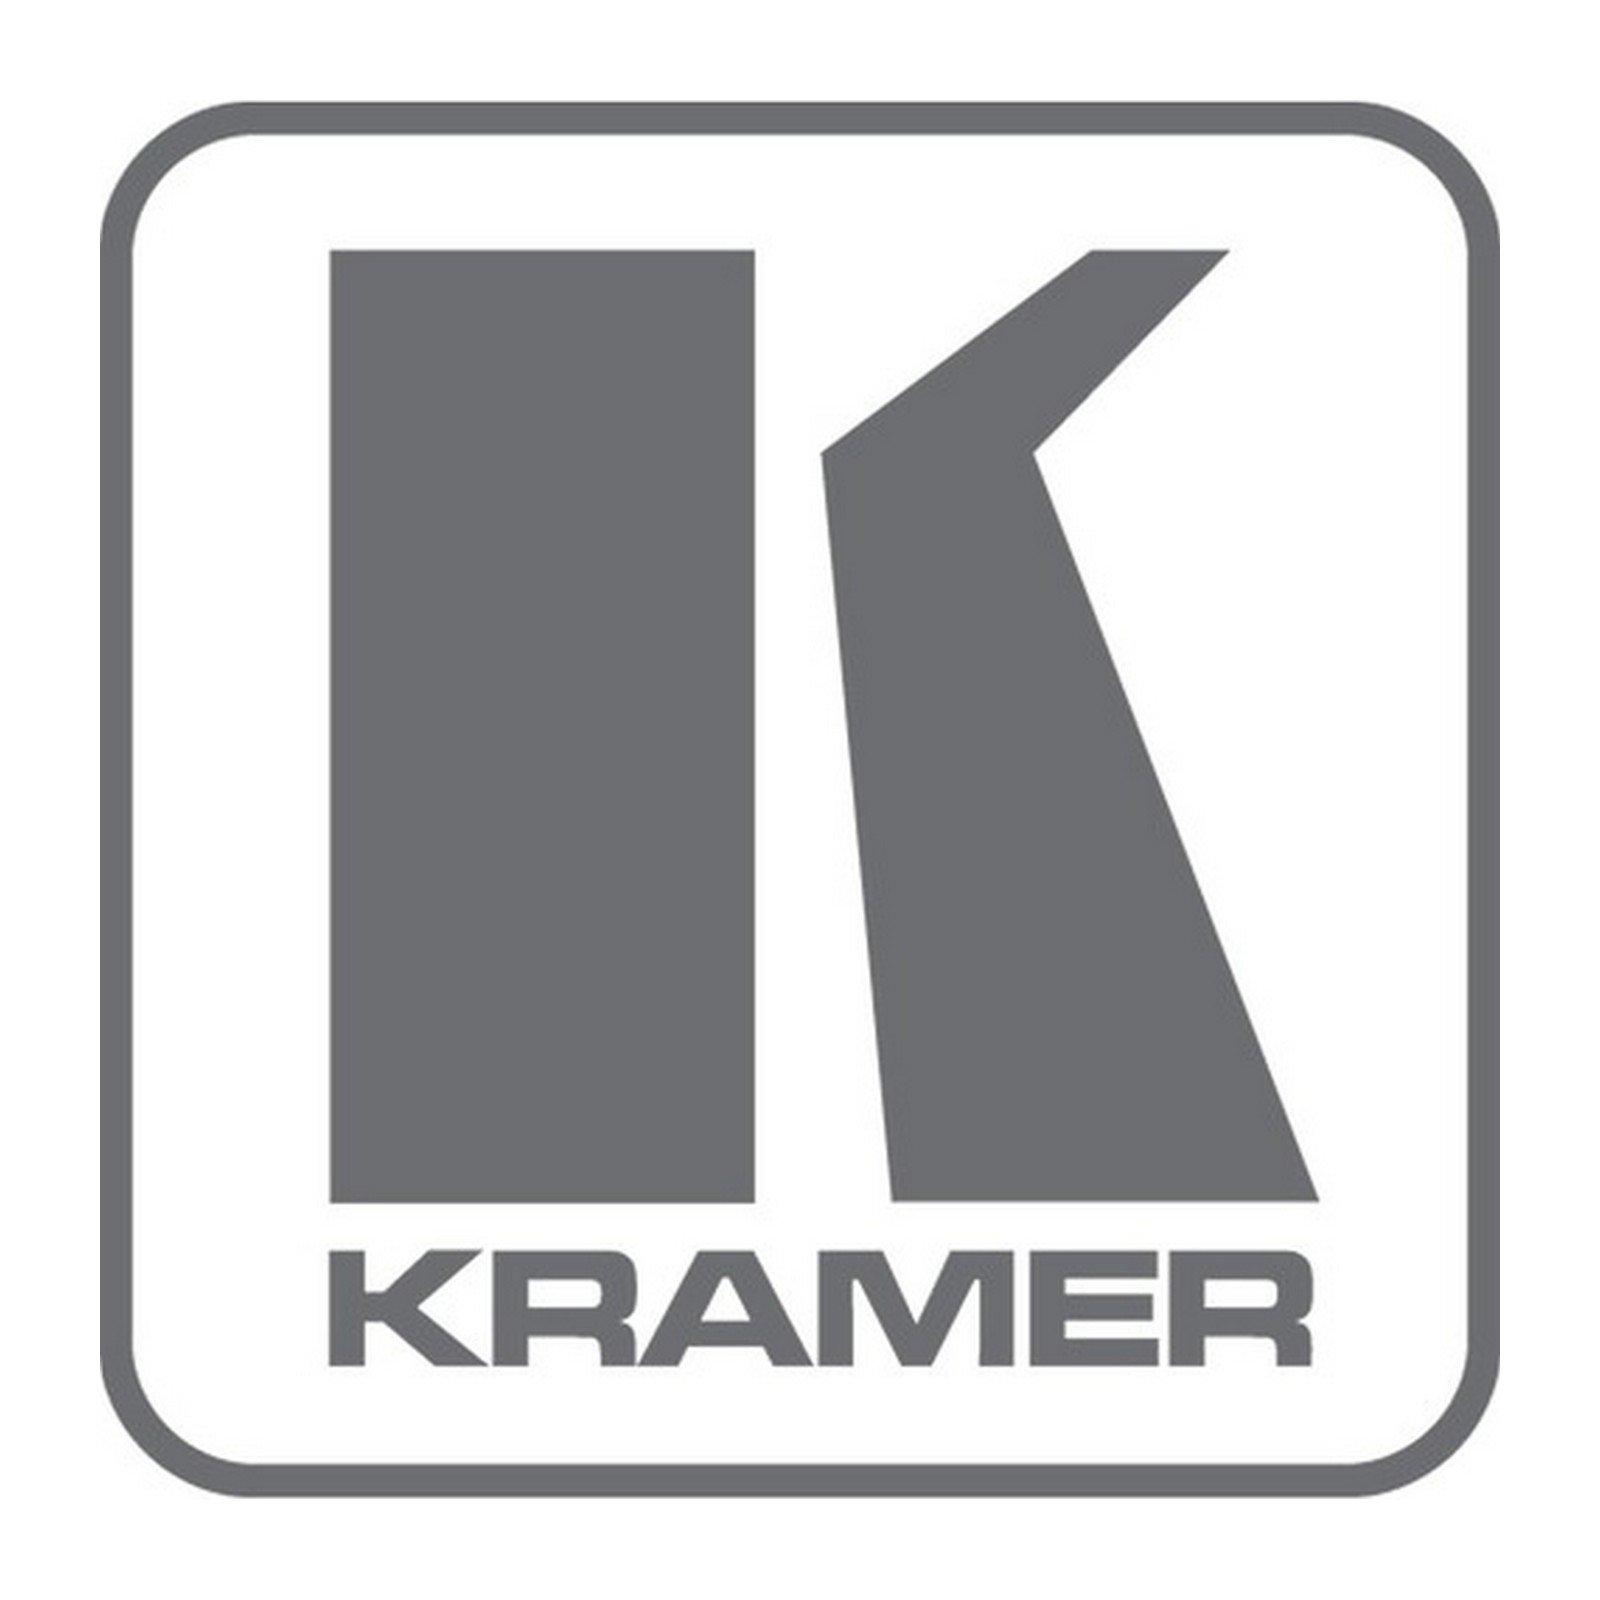 Kramer HH-IN2-F16 | 2 Input HDMI Interface Card for VS 1616D